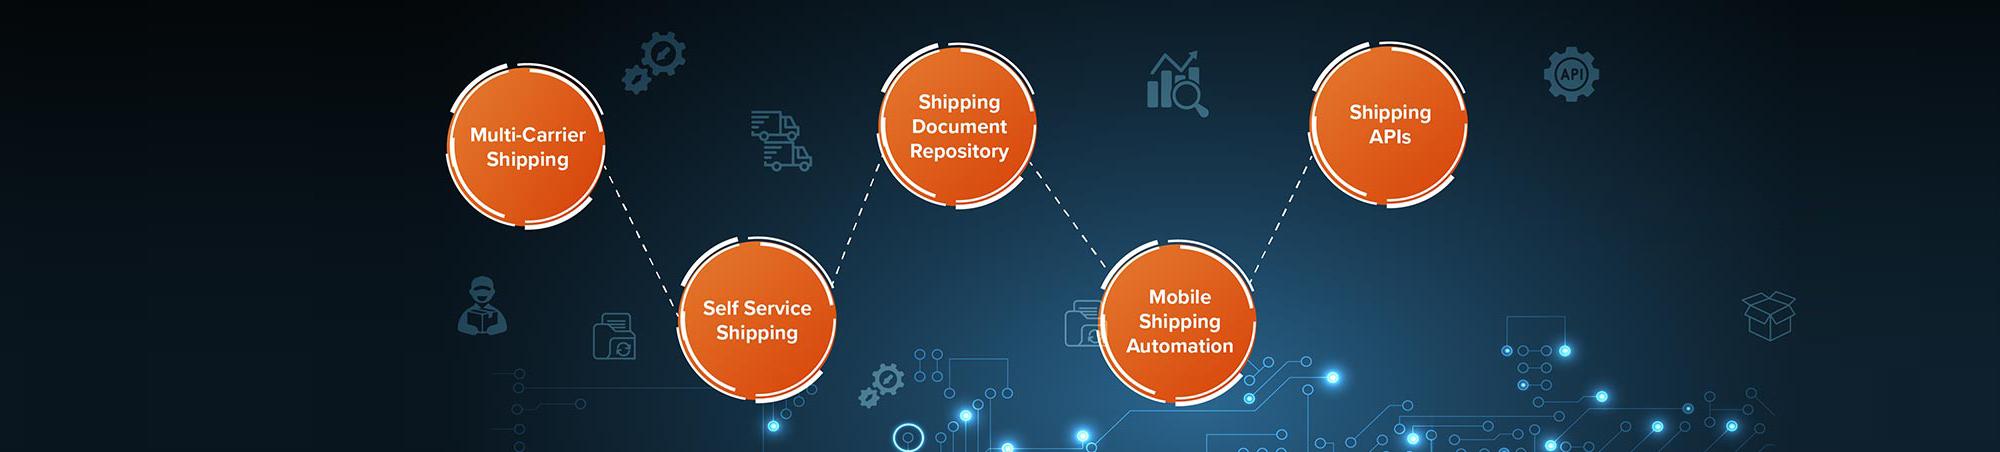 enterprise_shipping_automation